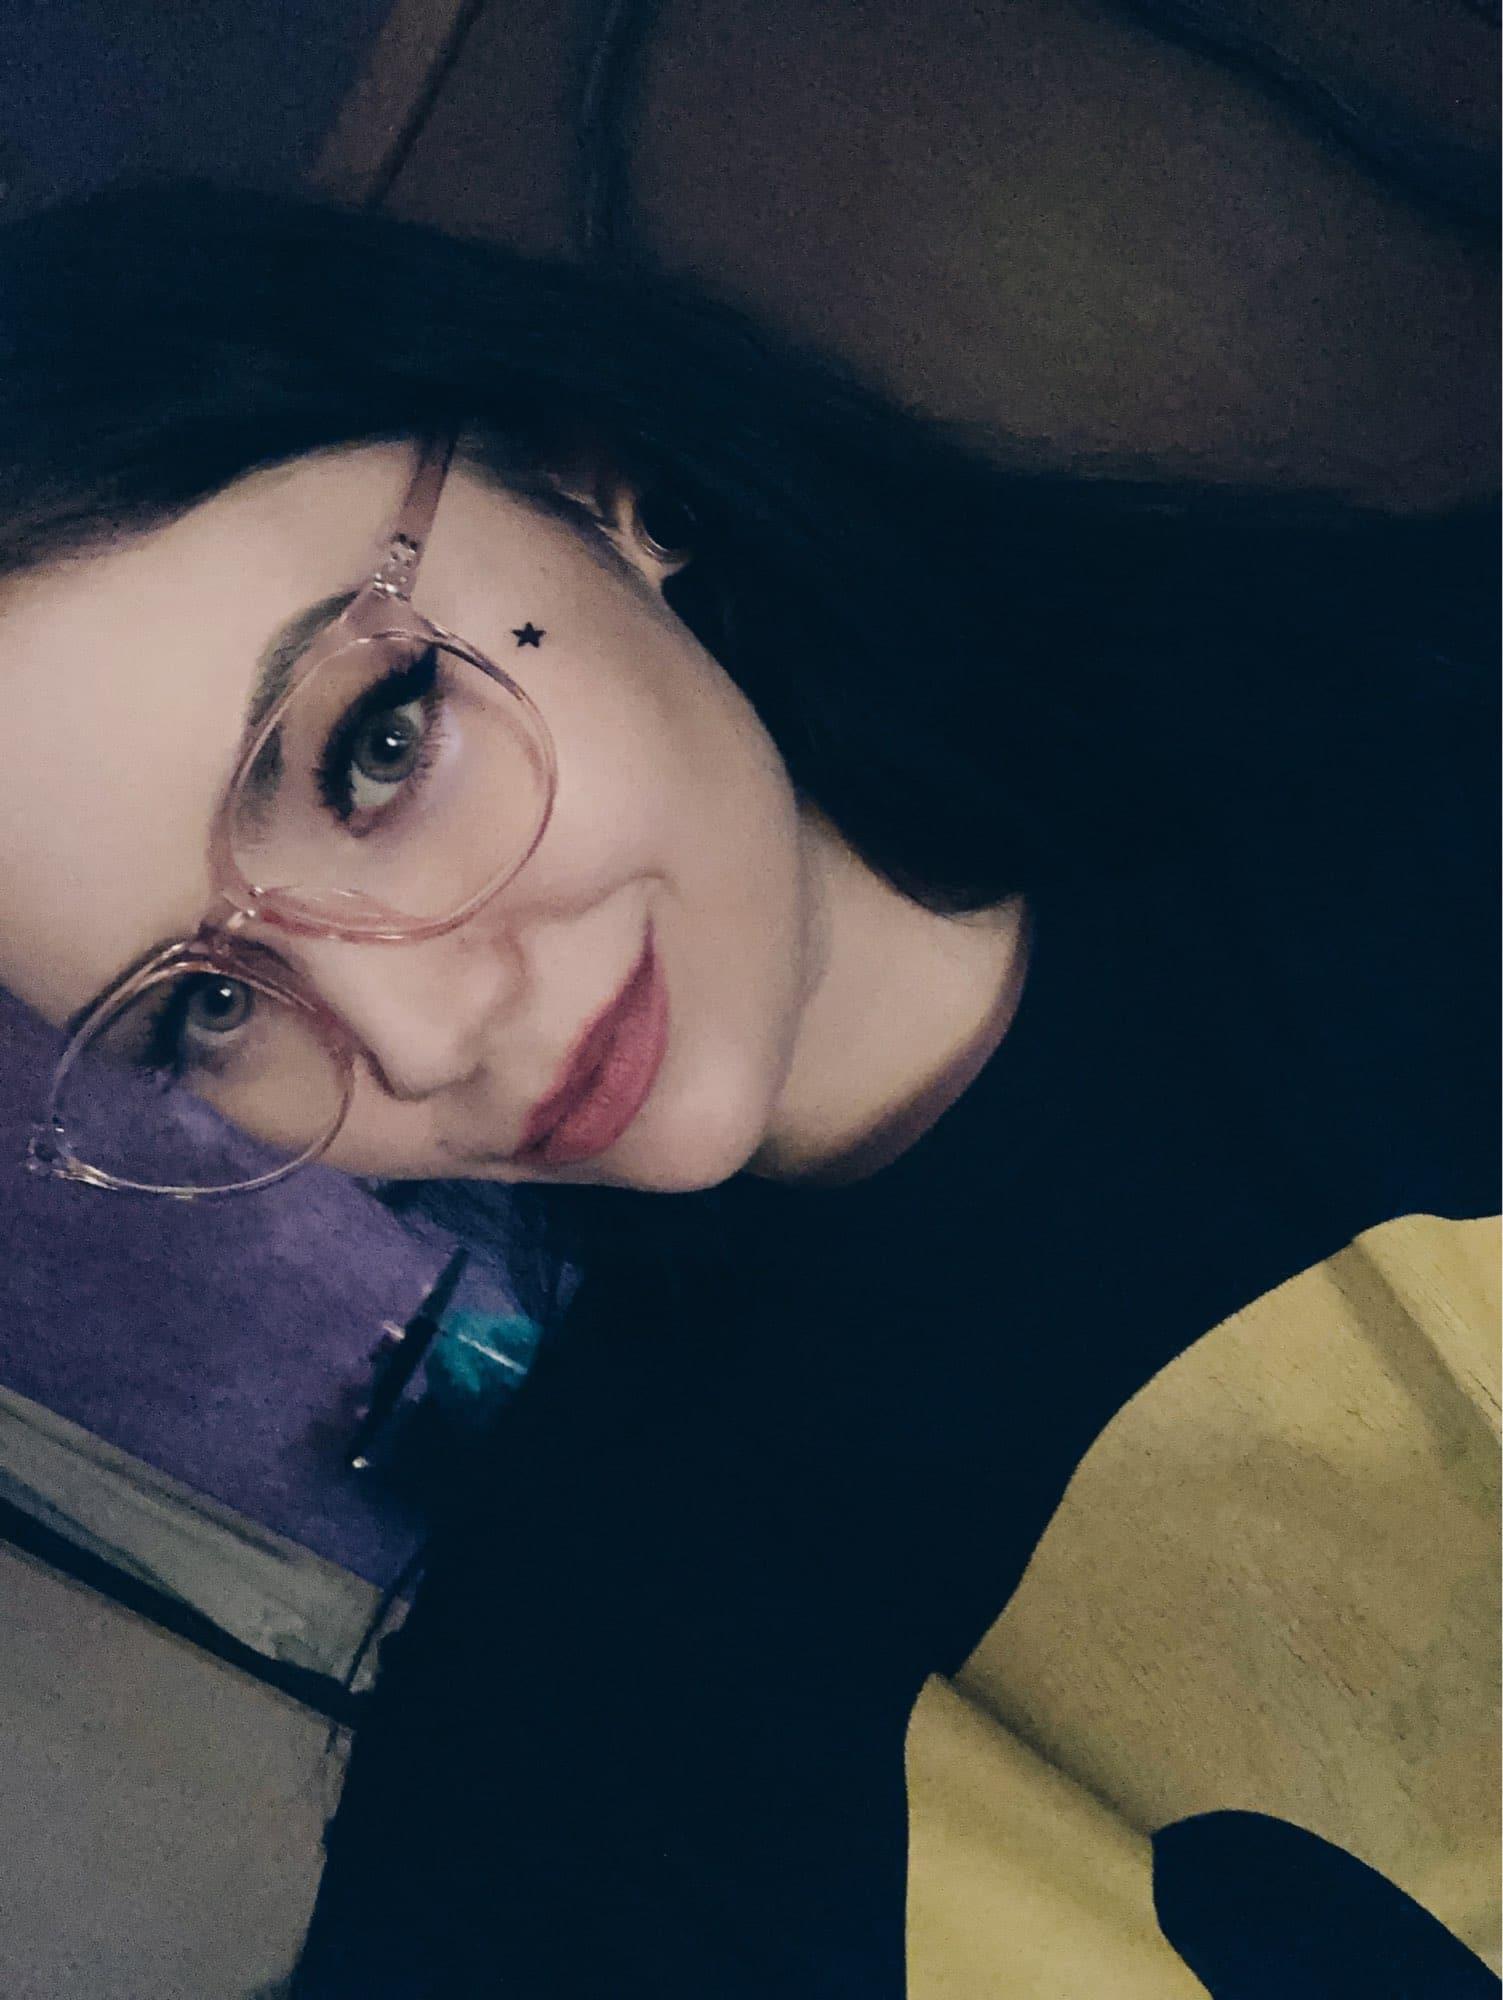 Alexa Paige